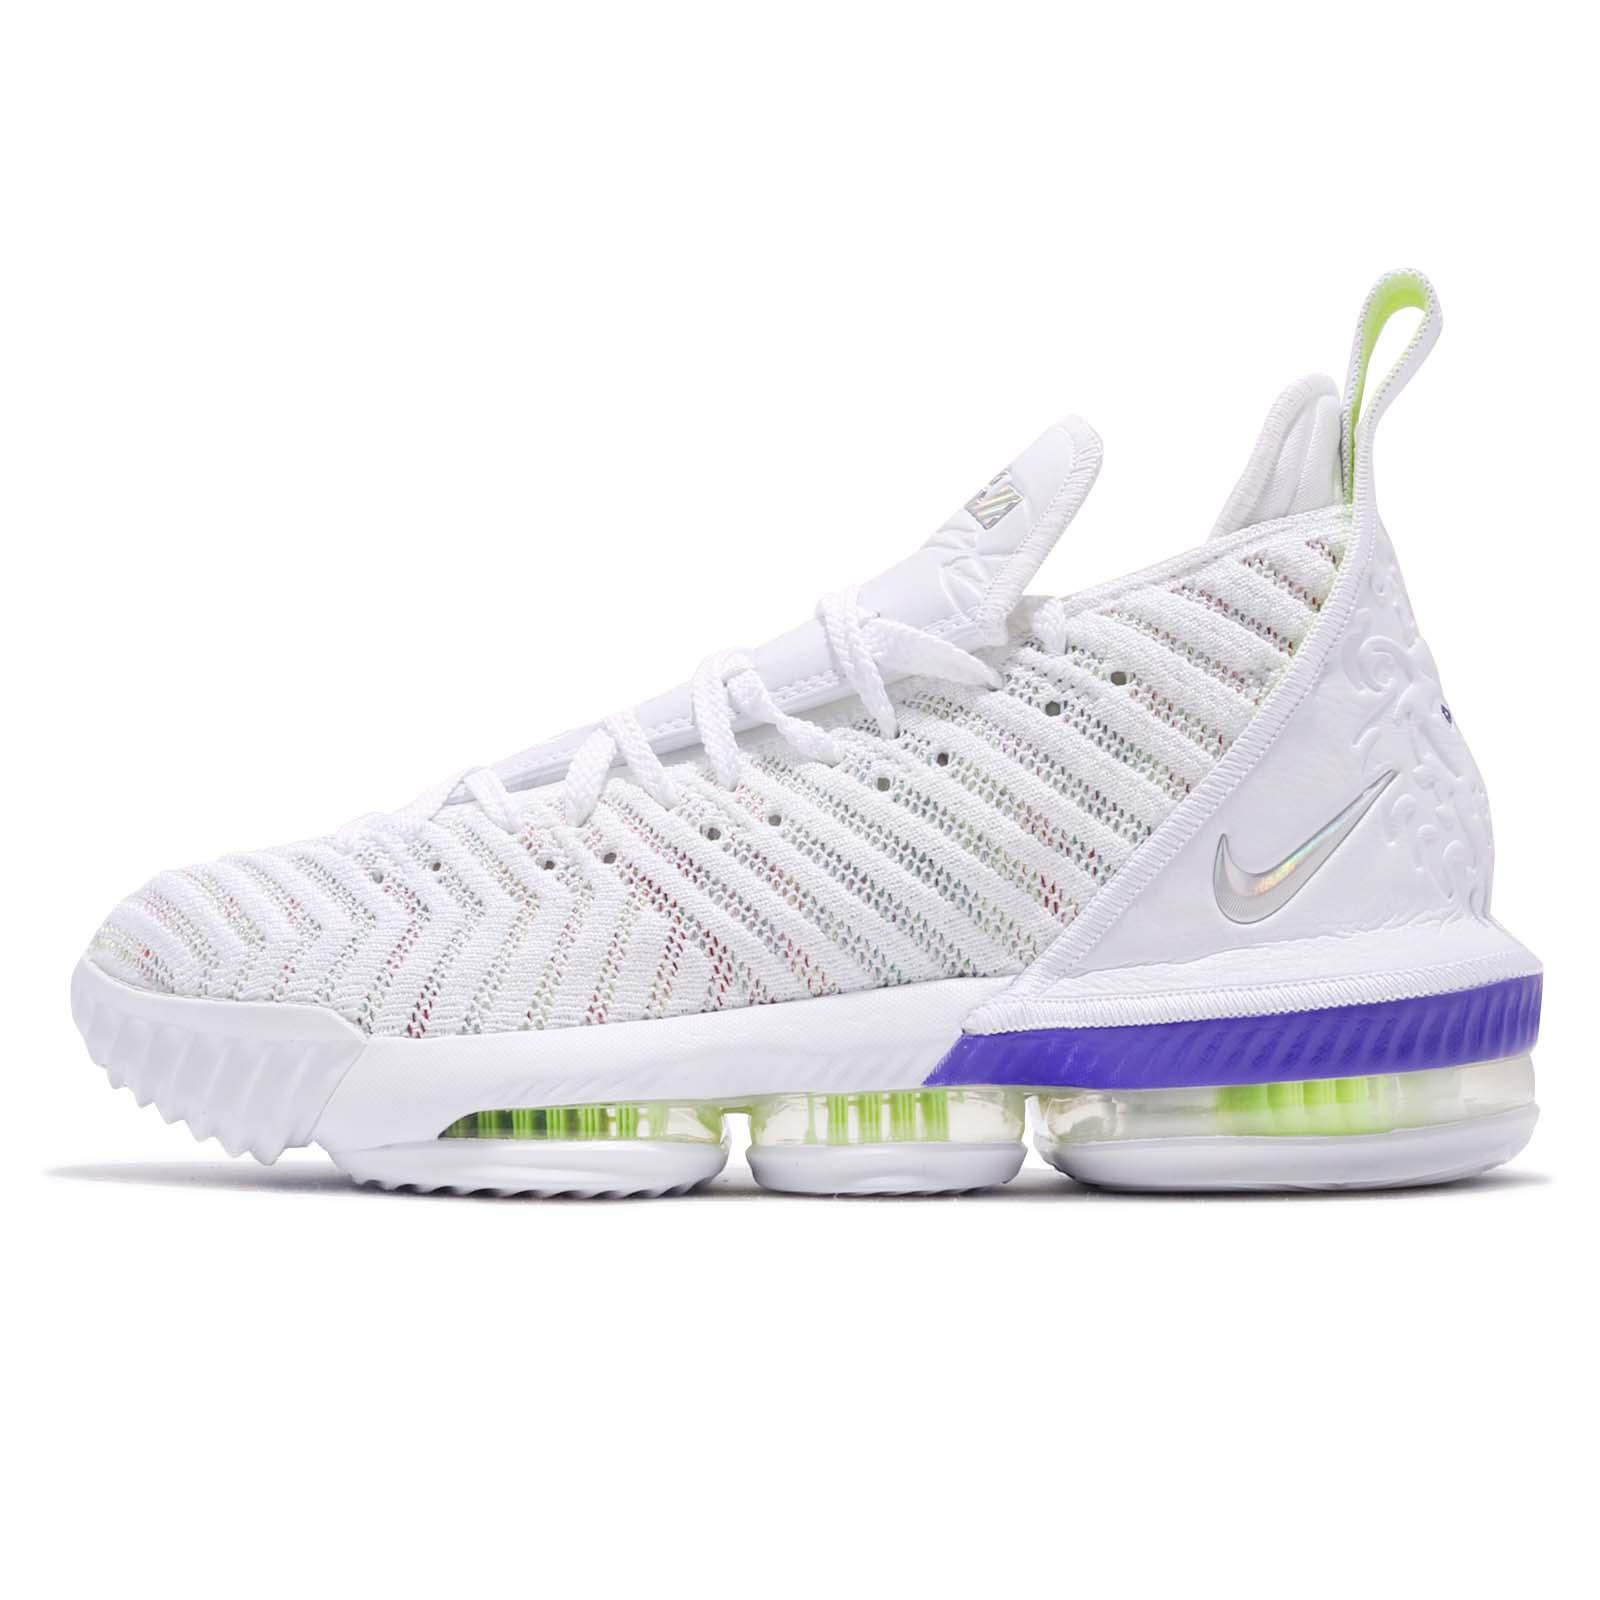 13dc88593cf Nike Lebron XVI EP 16 Buzz Lightyear James White Men Basketball Shoes  AO2595-102